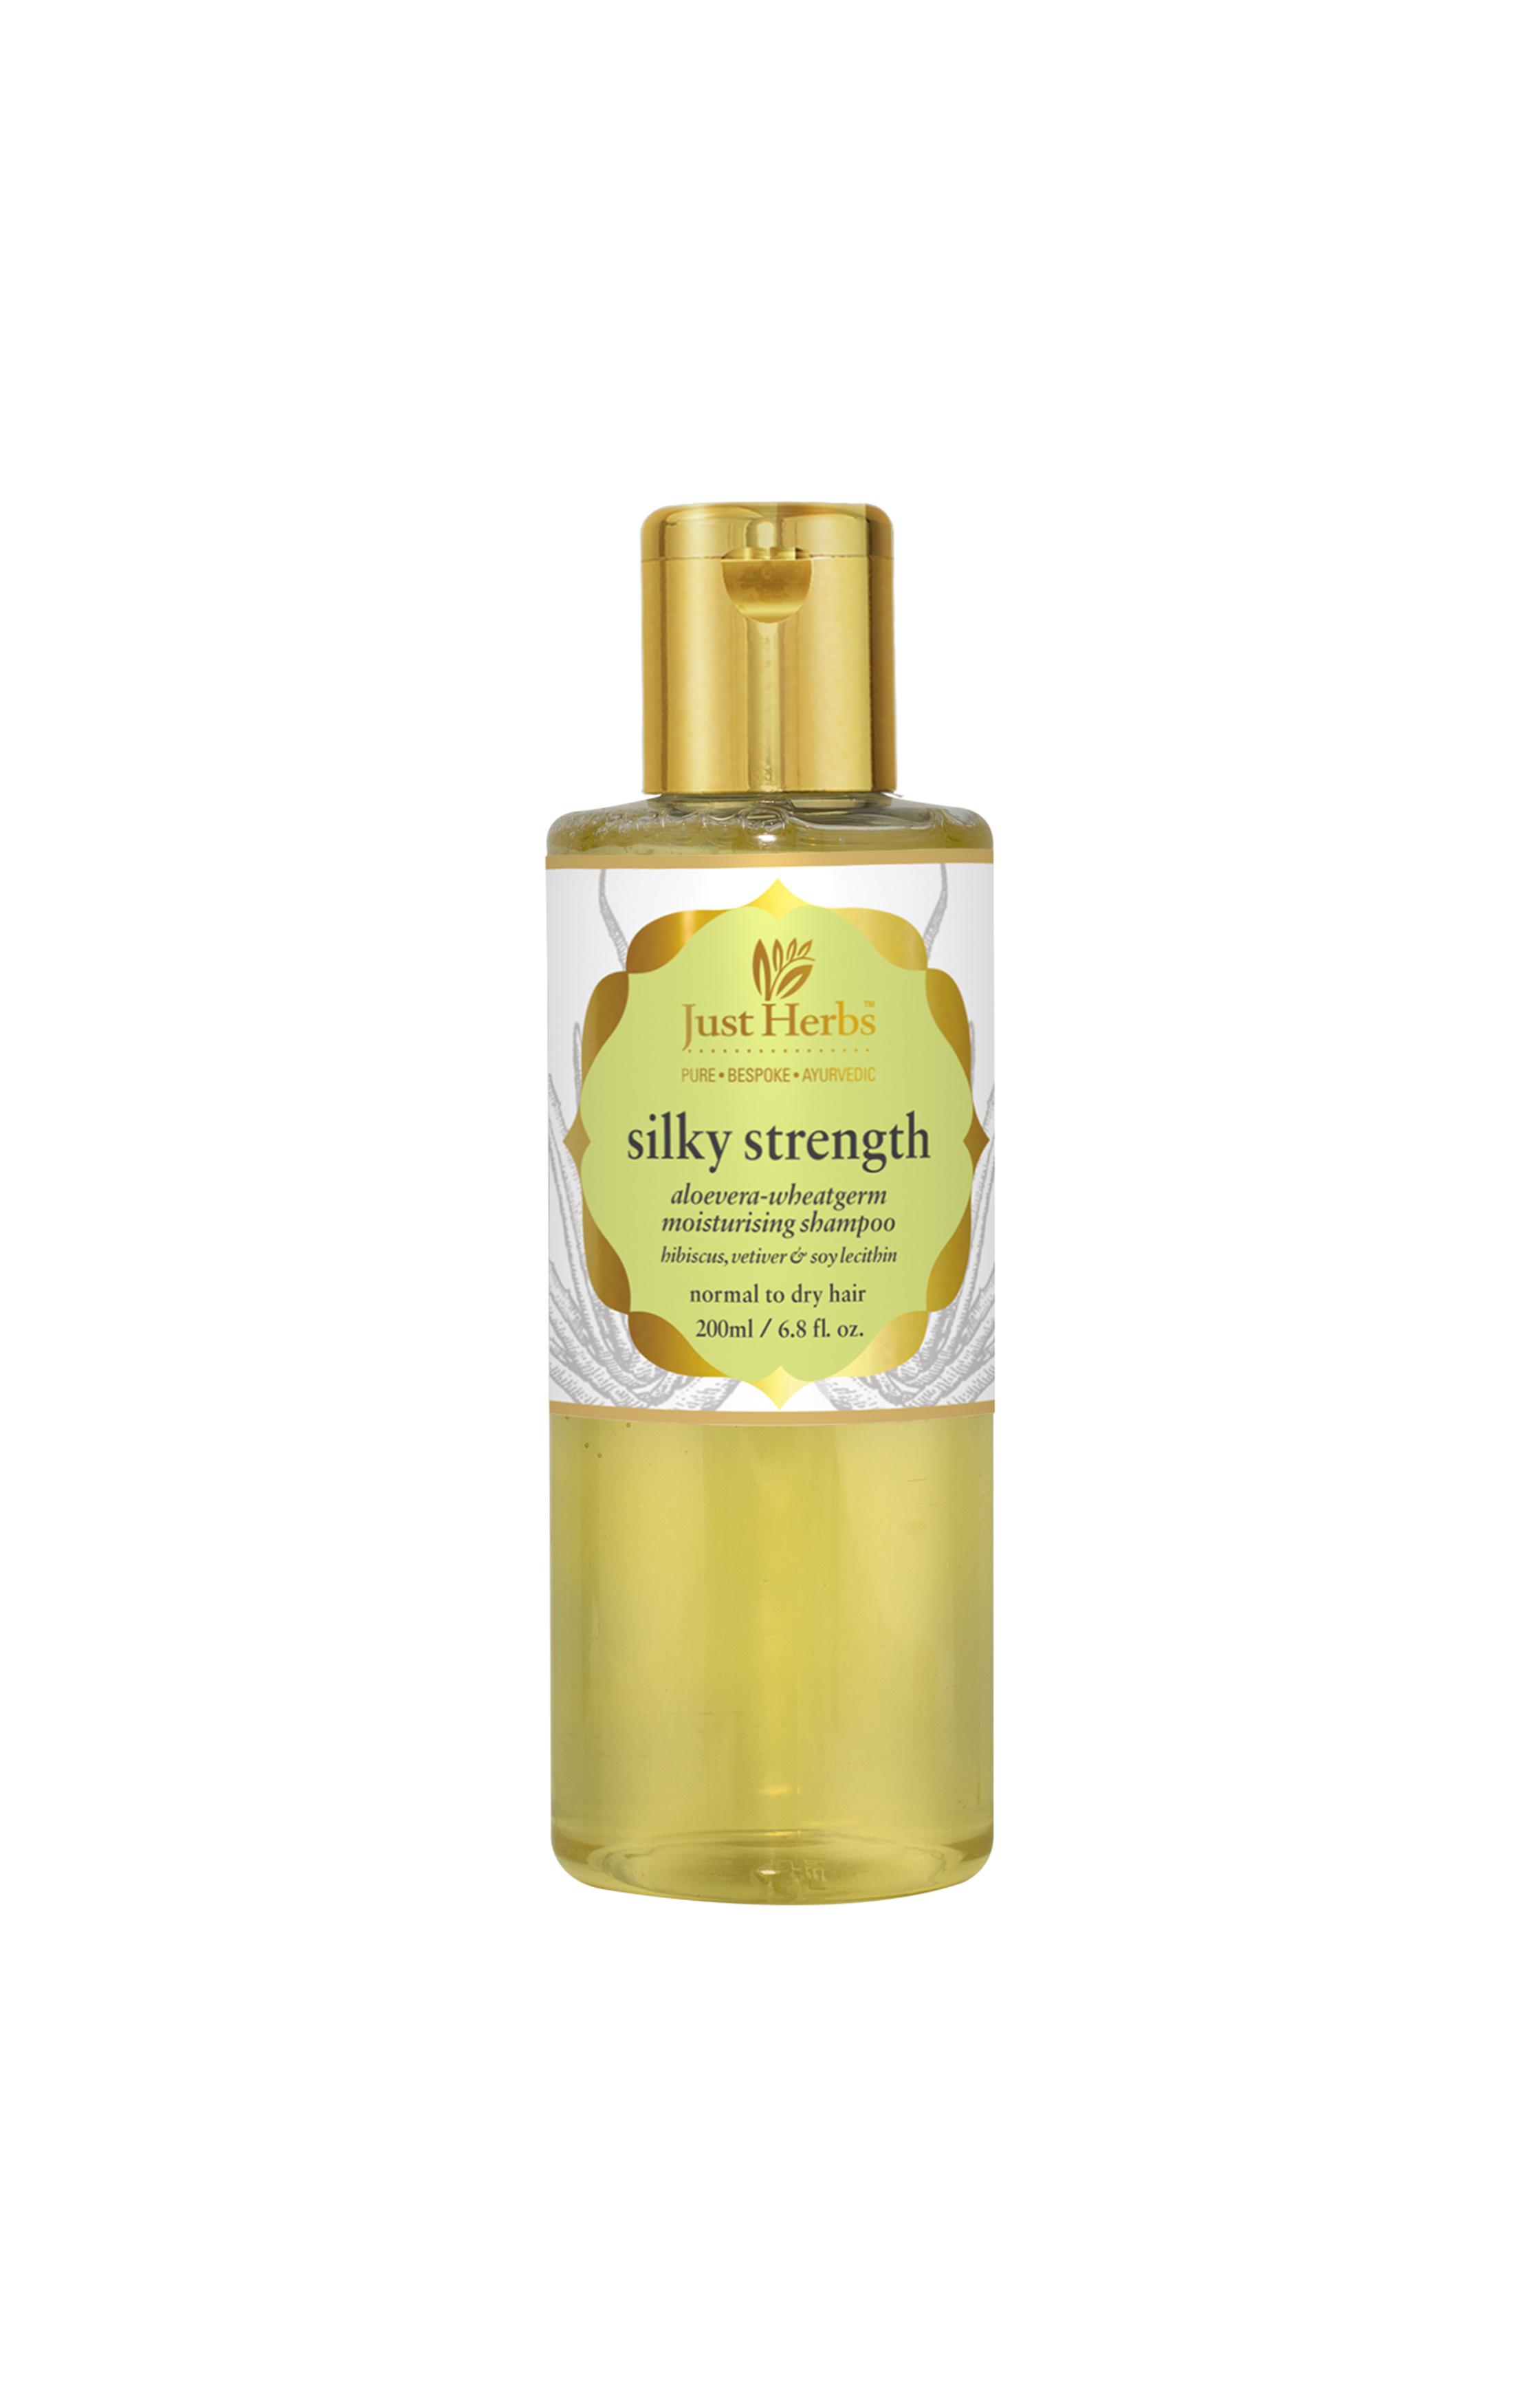 Just Herbs   Silky Strength Aloevera-Wheatgerm Moisturising Shampoo